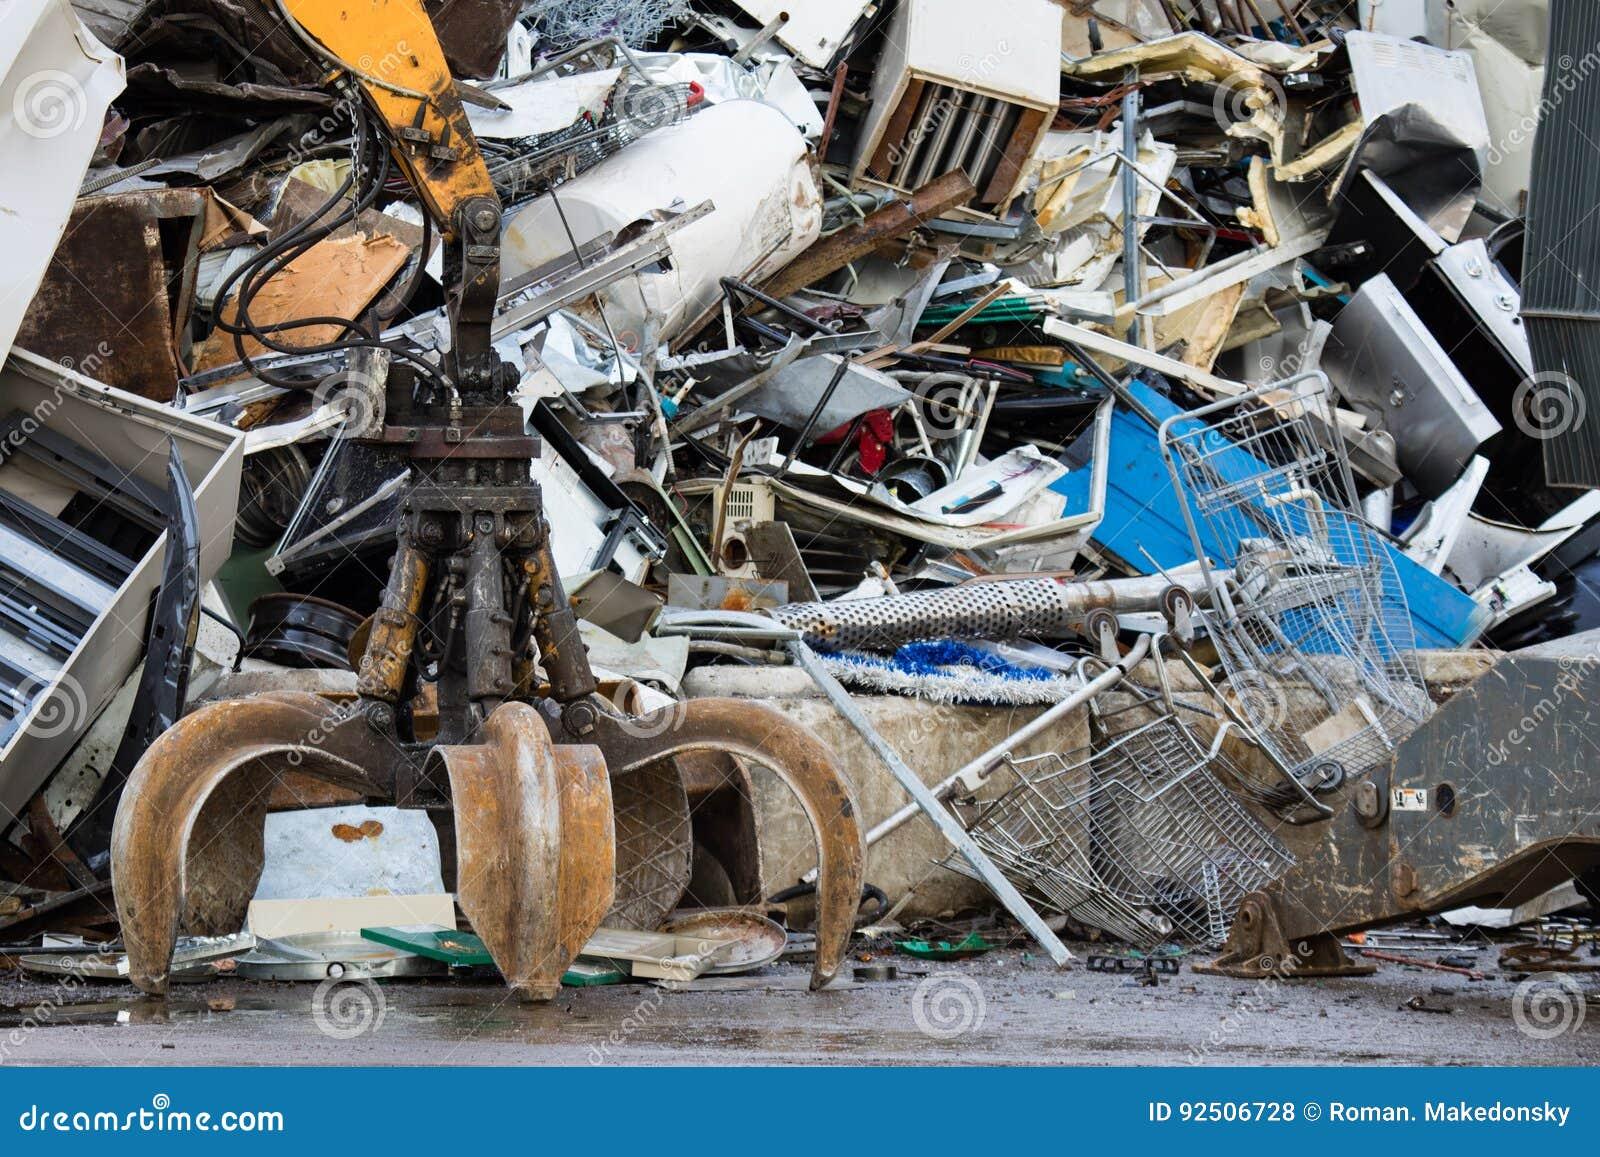 Metal Recycling Yard  Powerfull Mechanical Grabbyng Arm